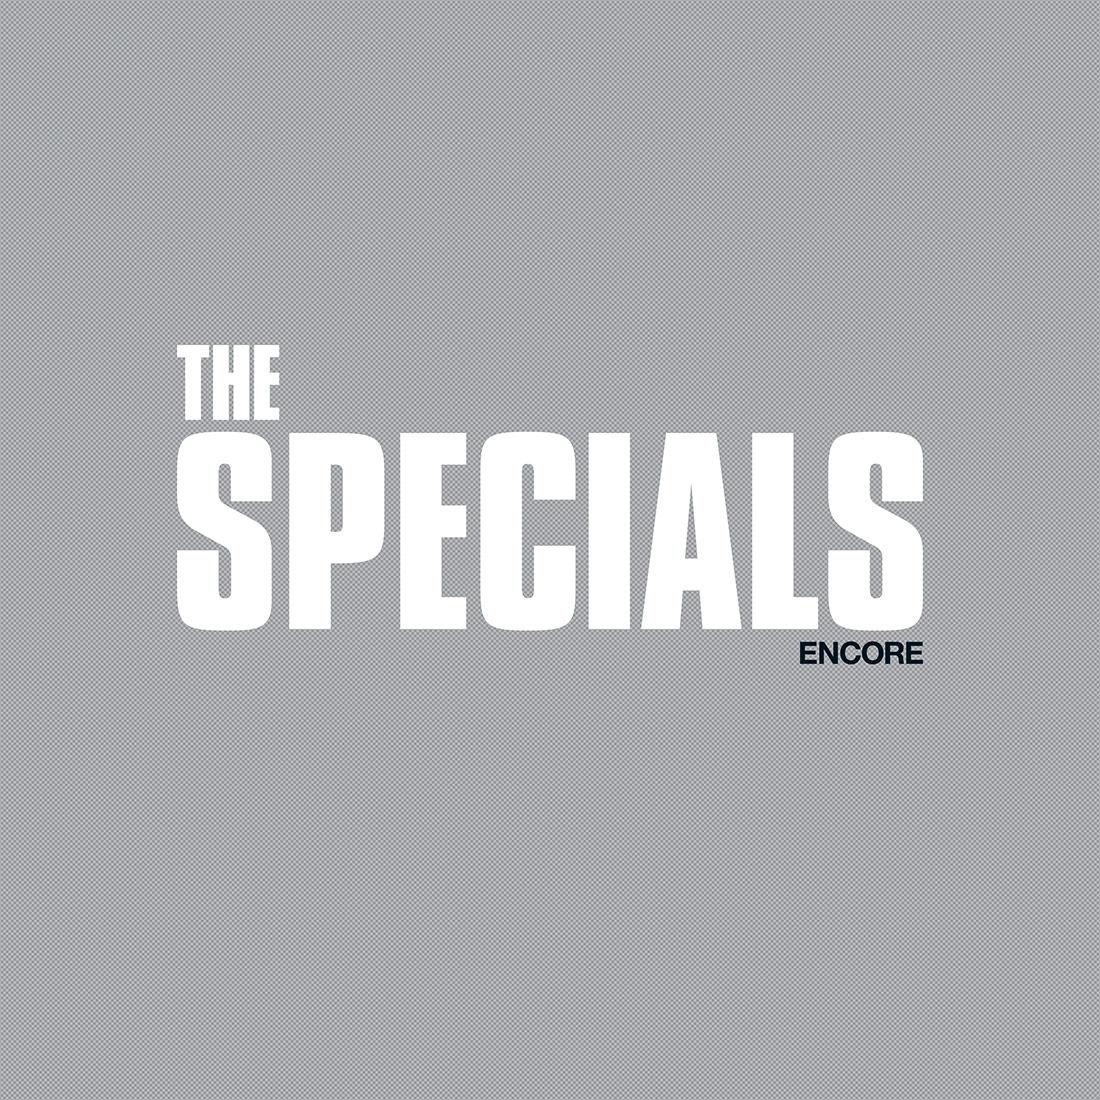 encore (the specials album) wikipedia specials letters specials #13